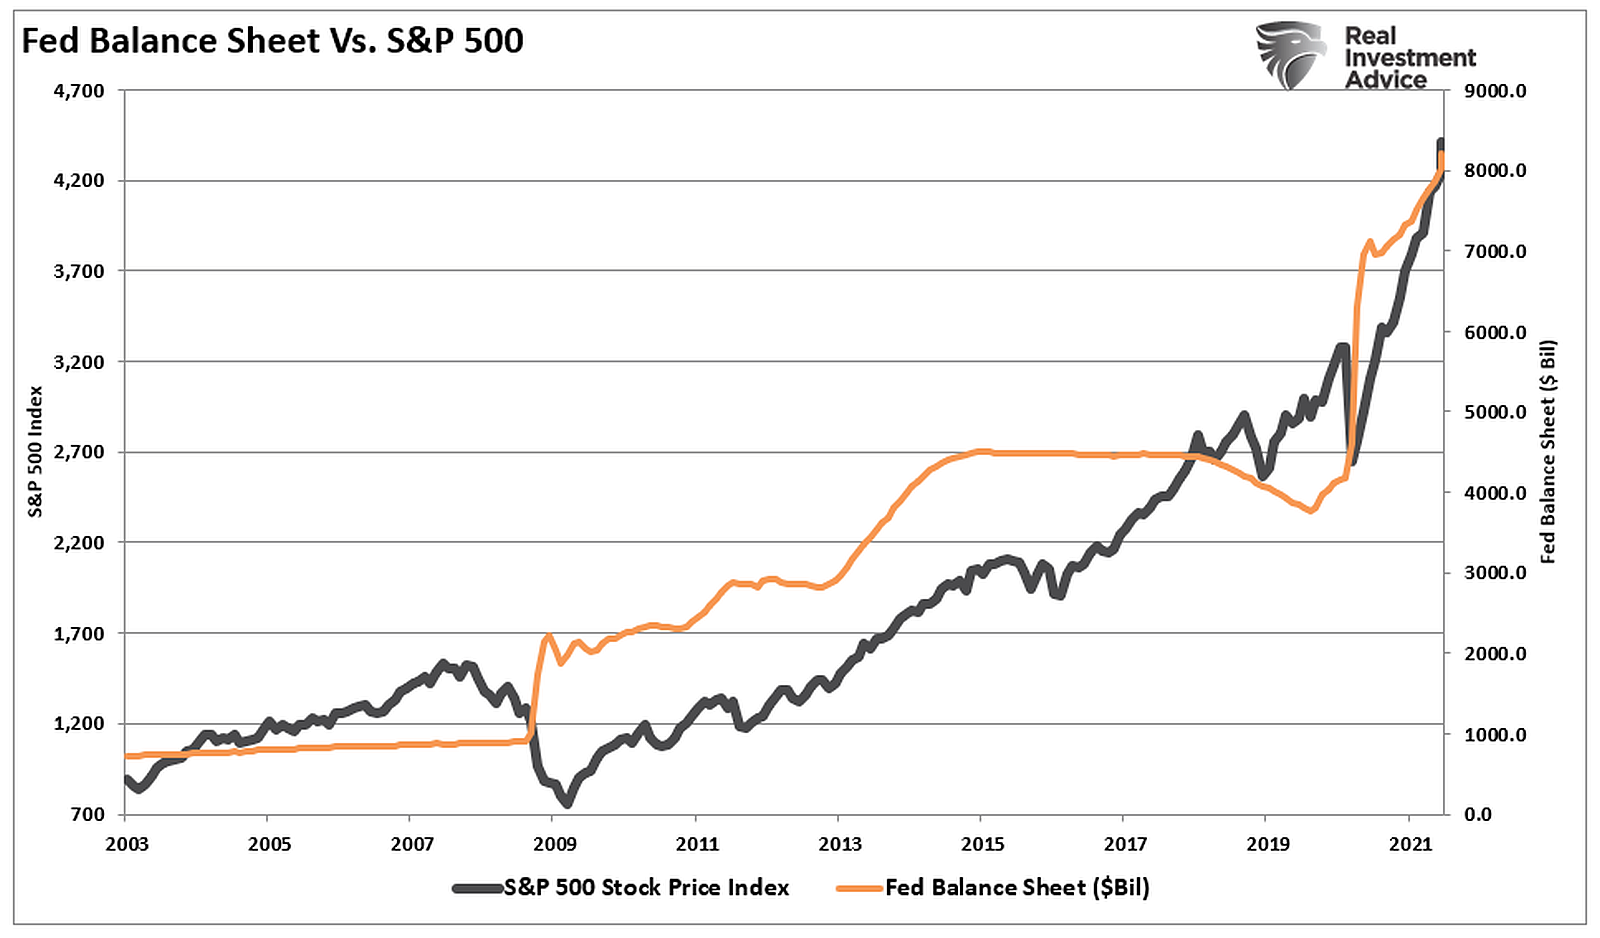 Fed-Balance-Sheet-vs-S&P-500